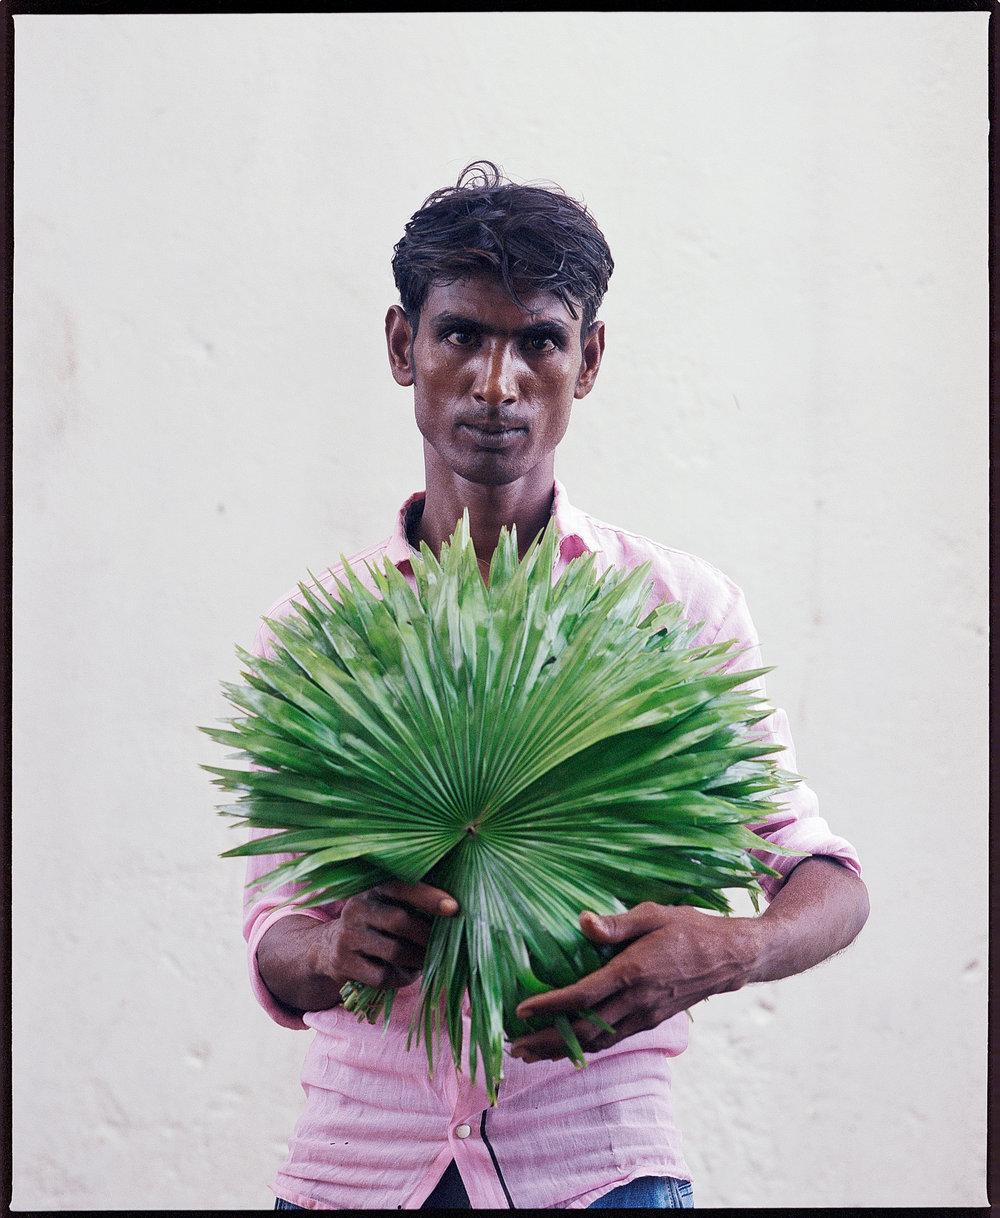 Kolkata_Flowers-10.jpg